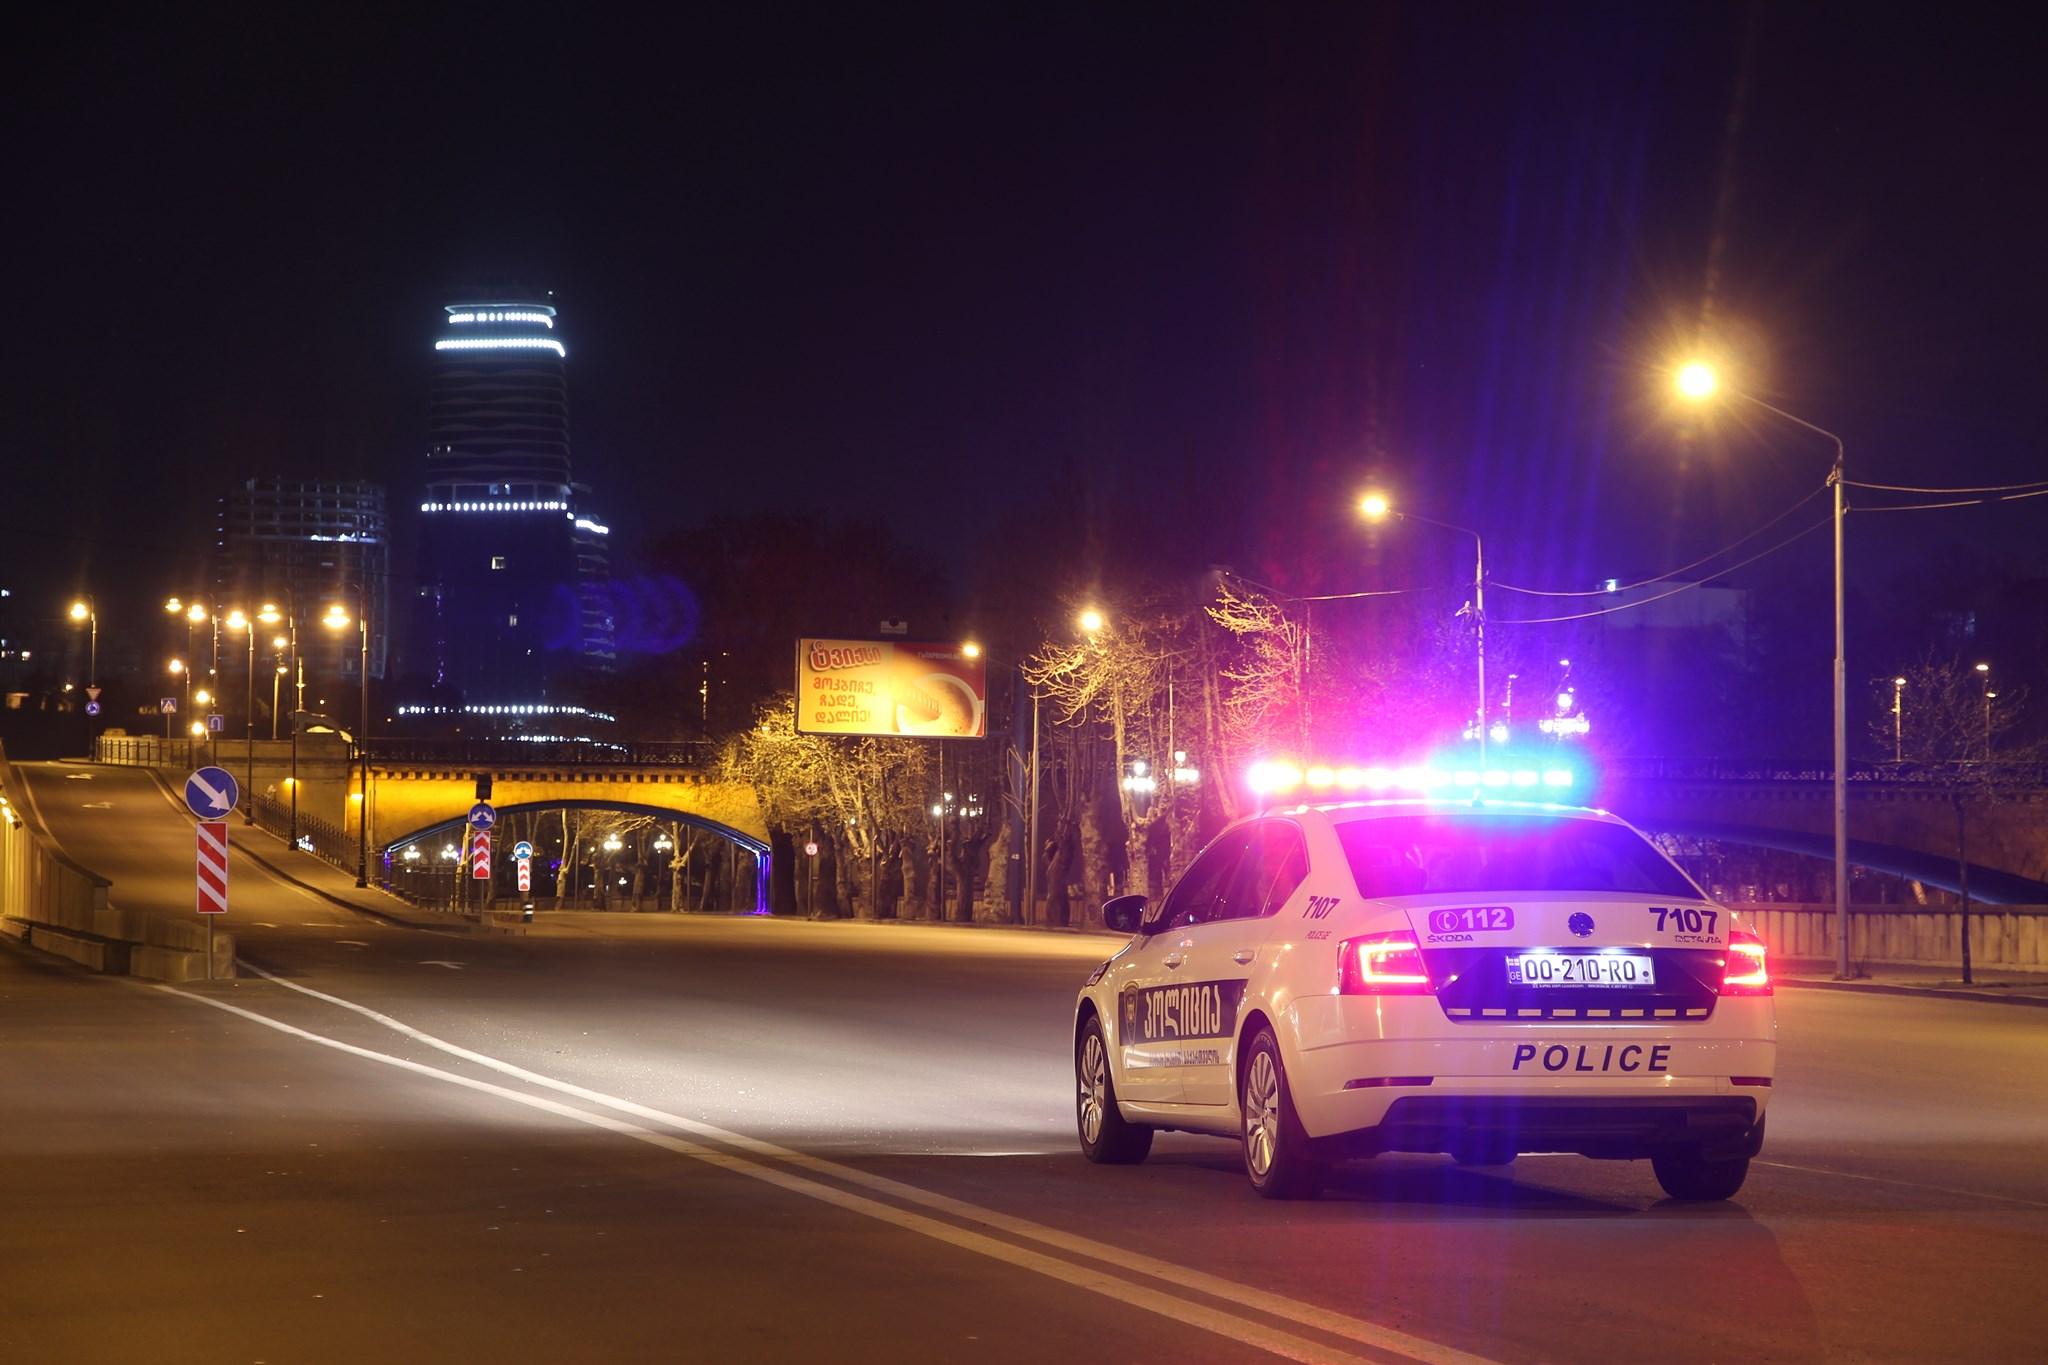 Police 13 #новости Covid-19, комендантский час, коронавирус, коронавирус в Грузии, Пасха